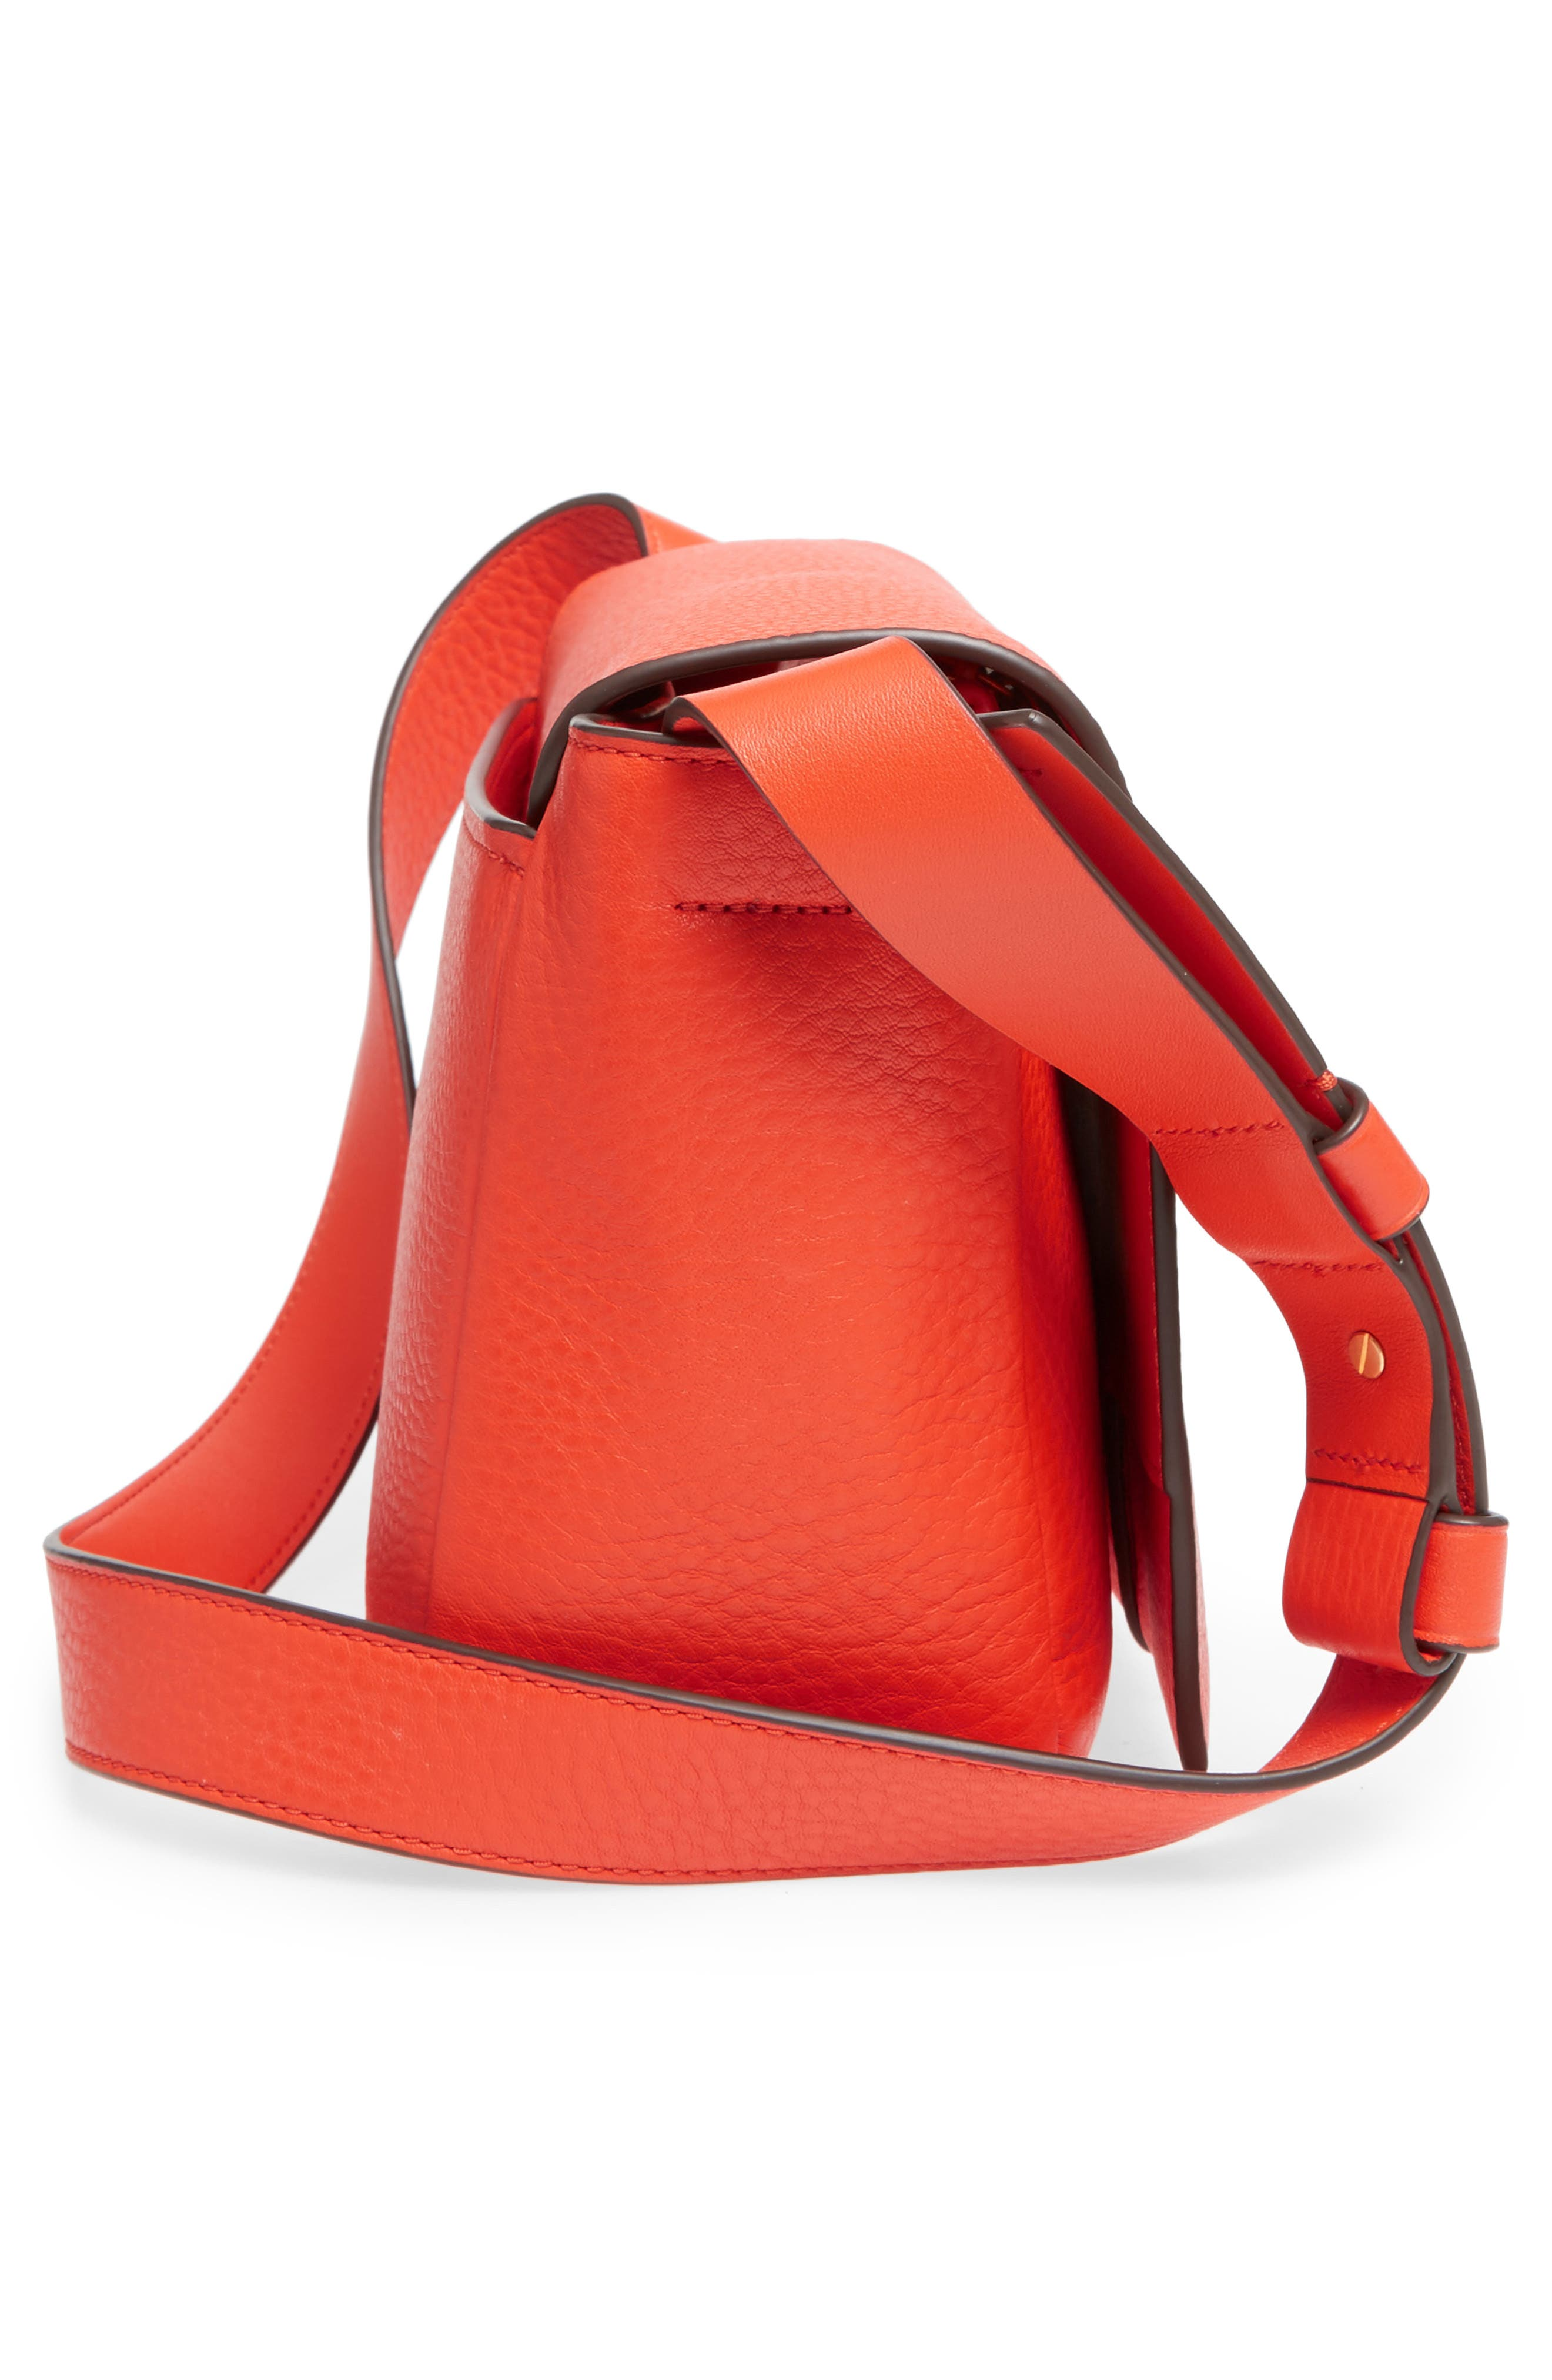 Block-T Pebbled Leather Shoulder Bag,                             Alternate thumbnail 5, color,                             Spicy Orange